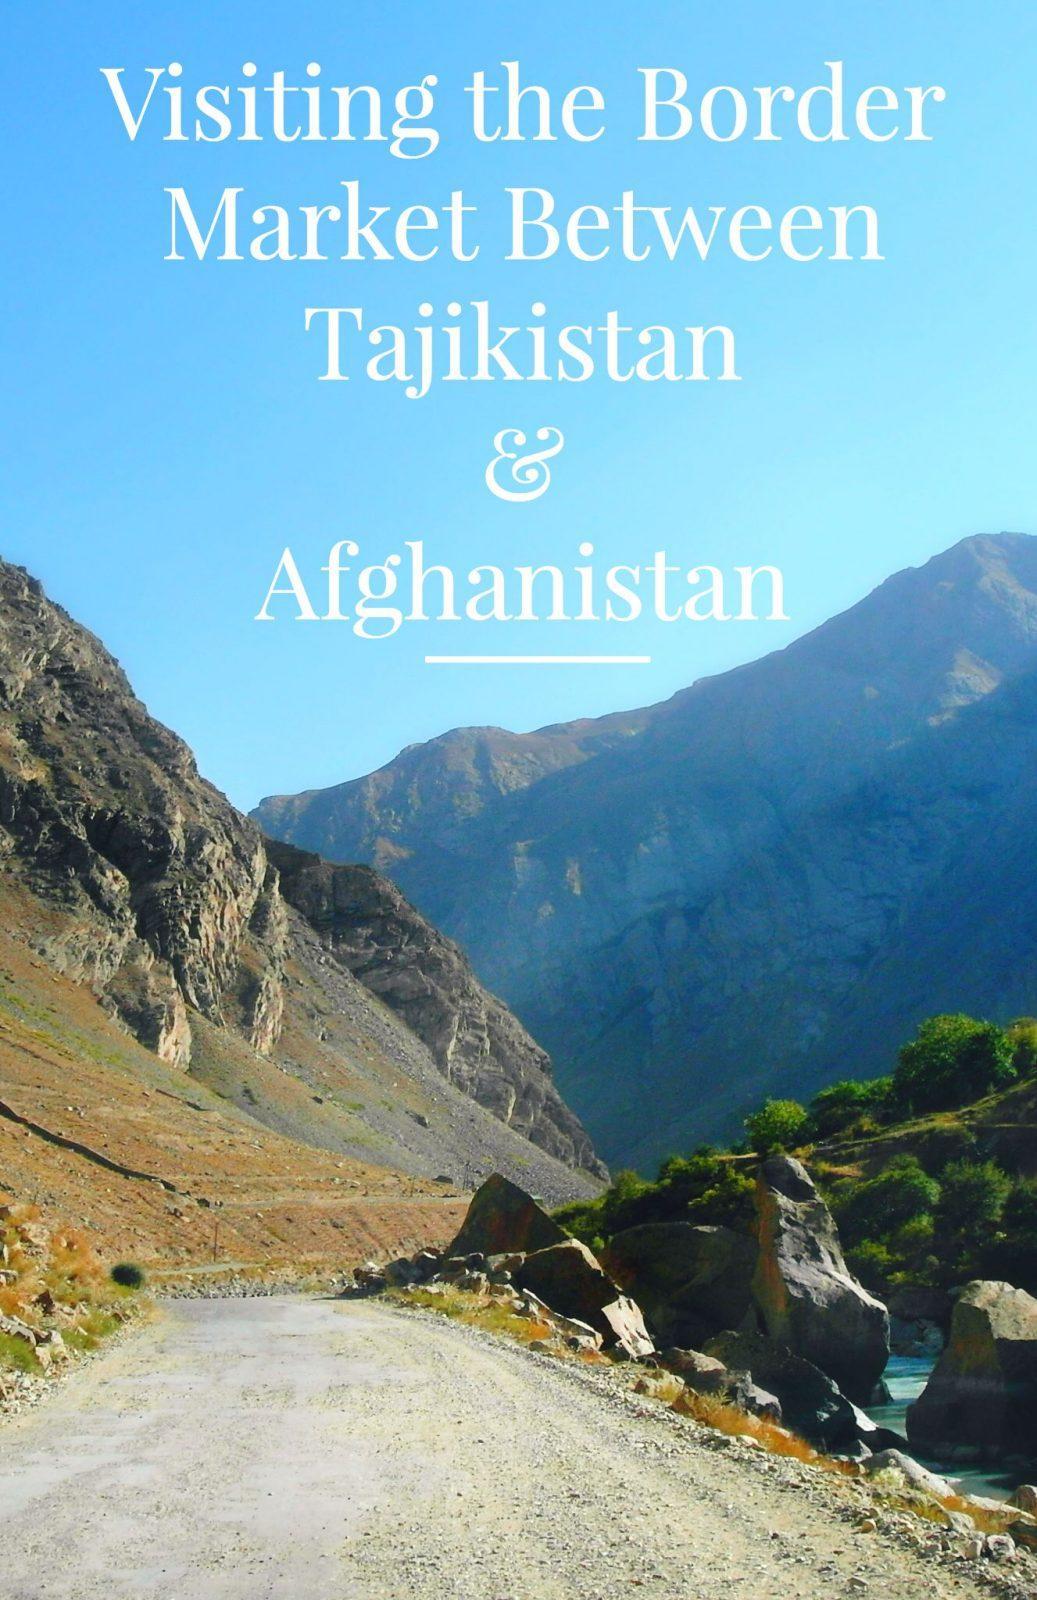 Ishkashim Market at Tajikistan Afghanistan Border